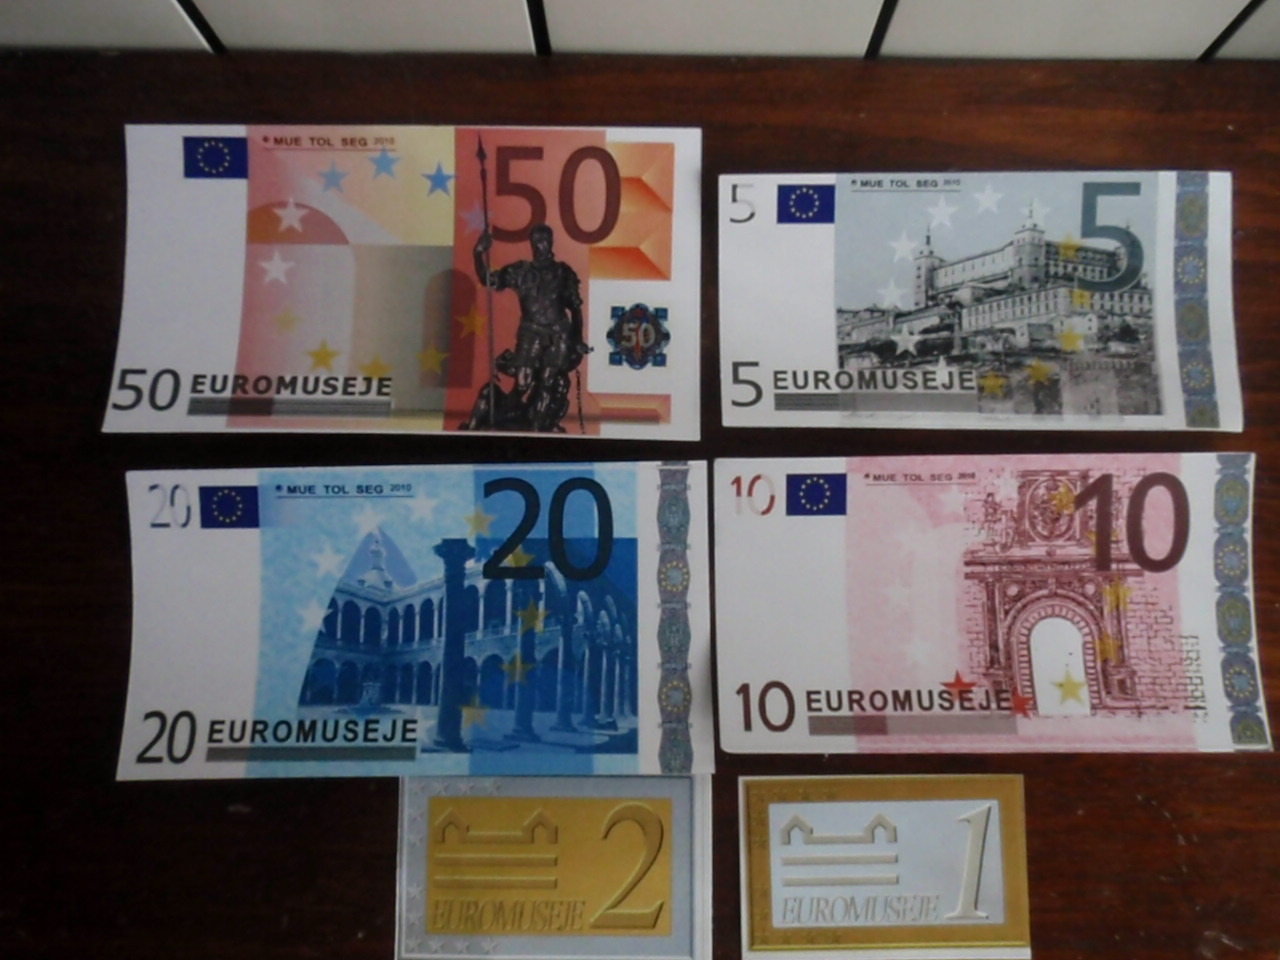 Euromuseje 2iho3kj